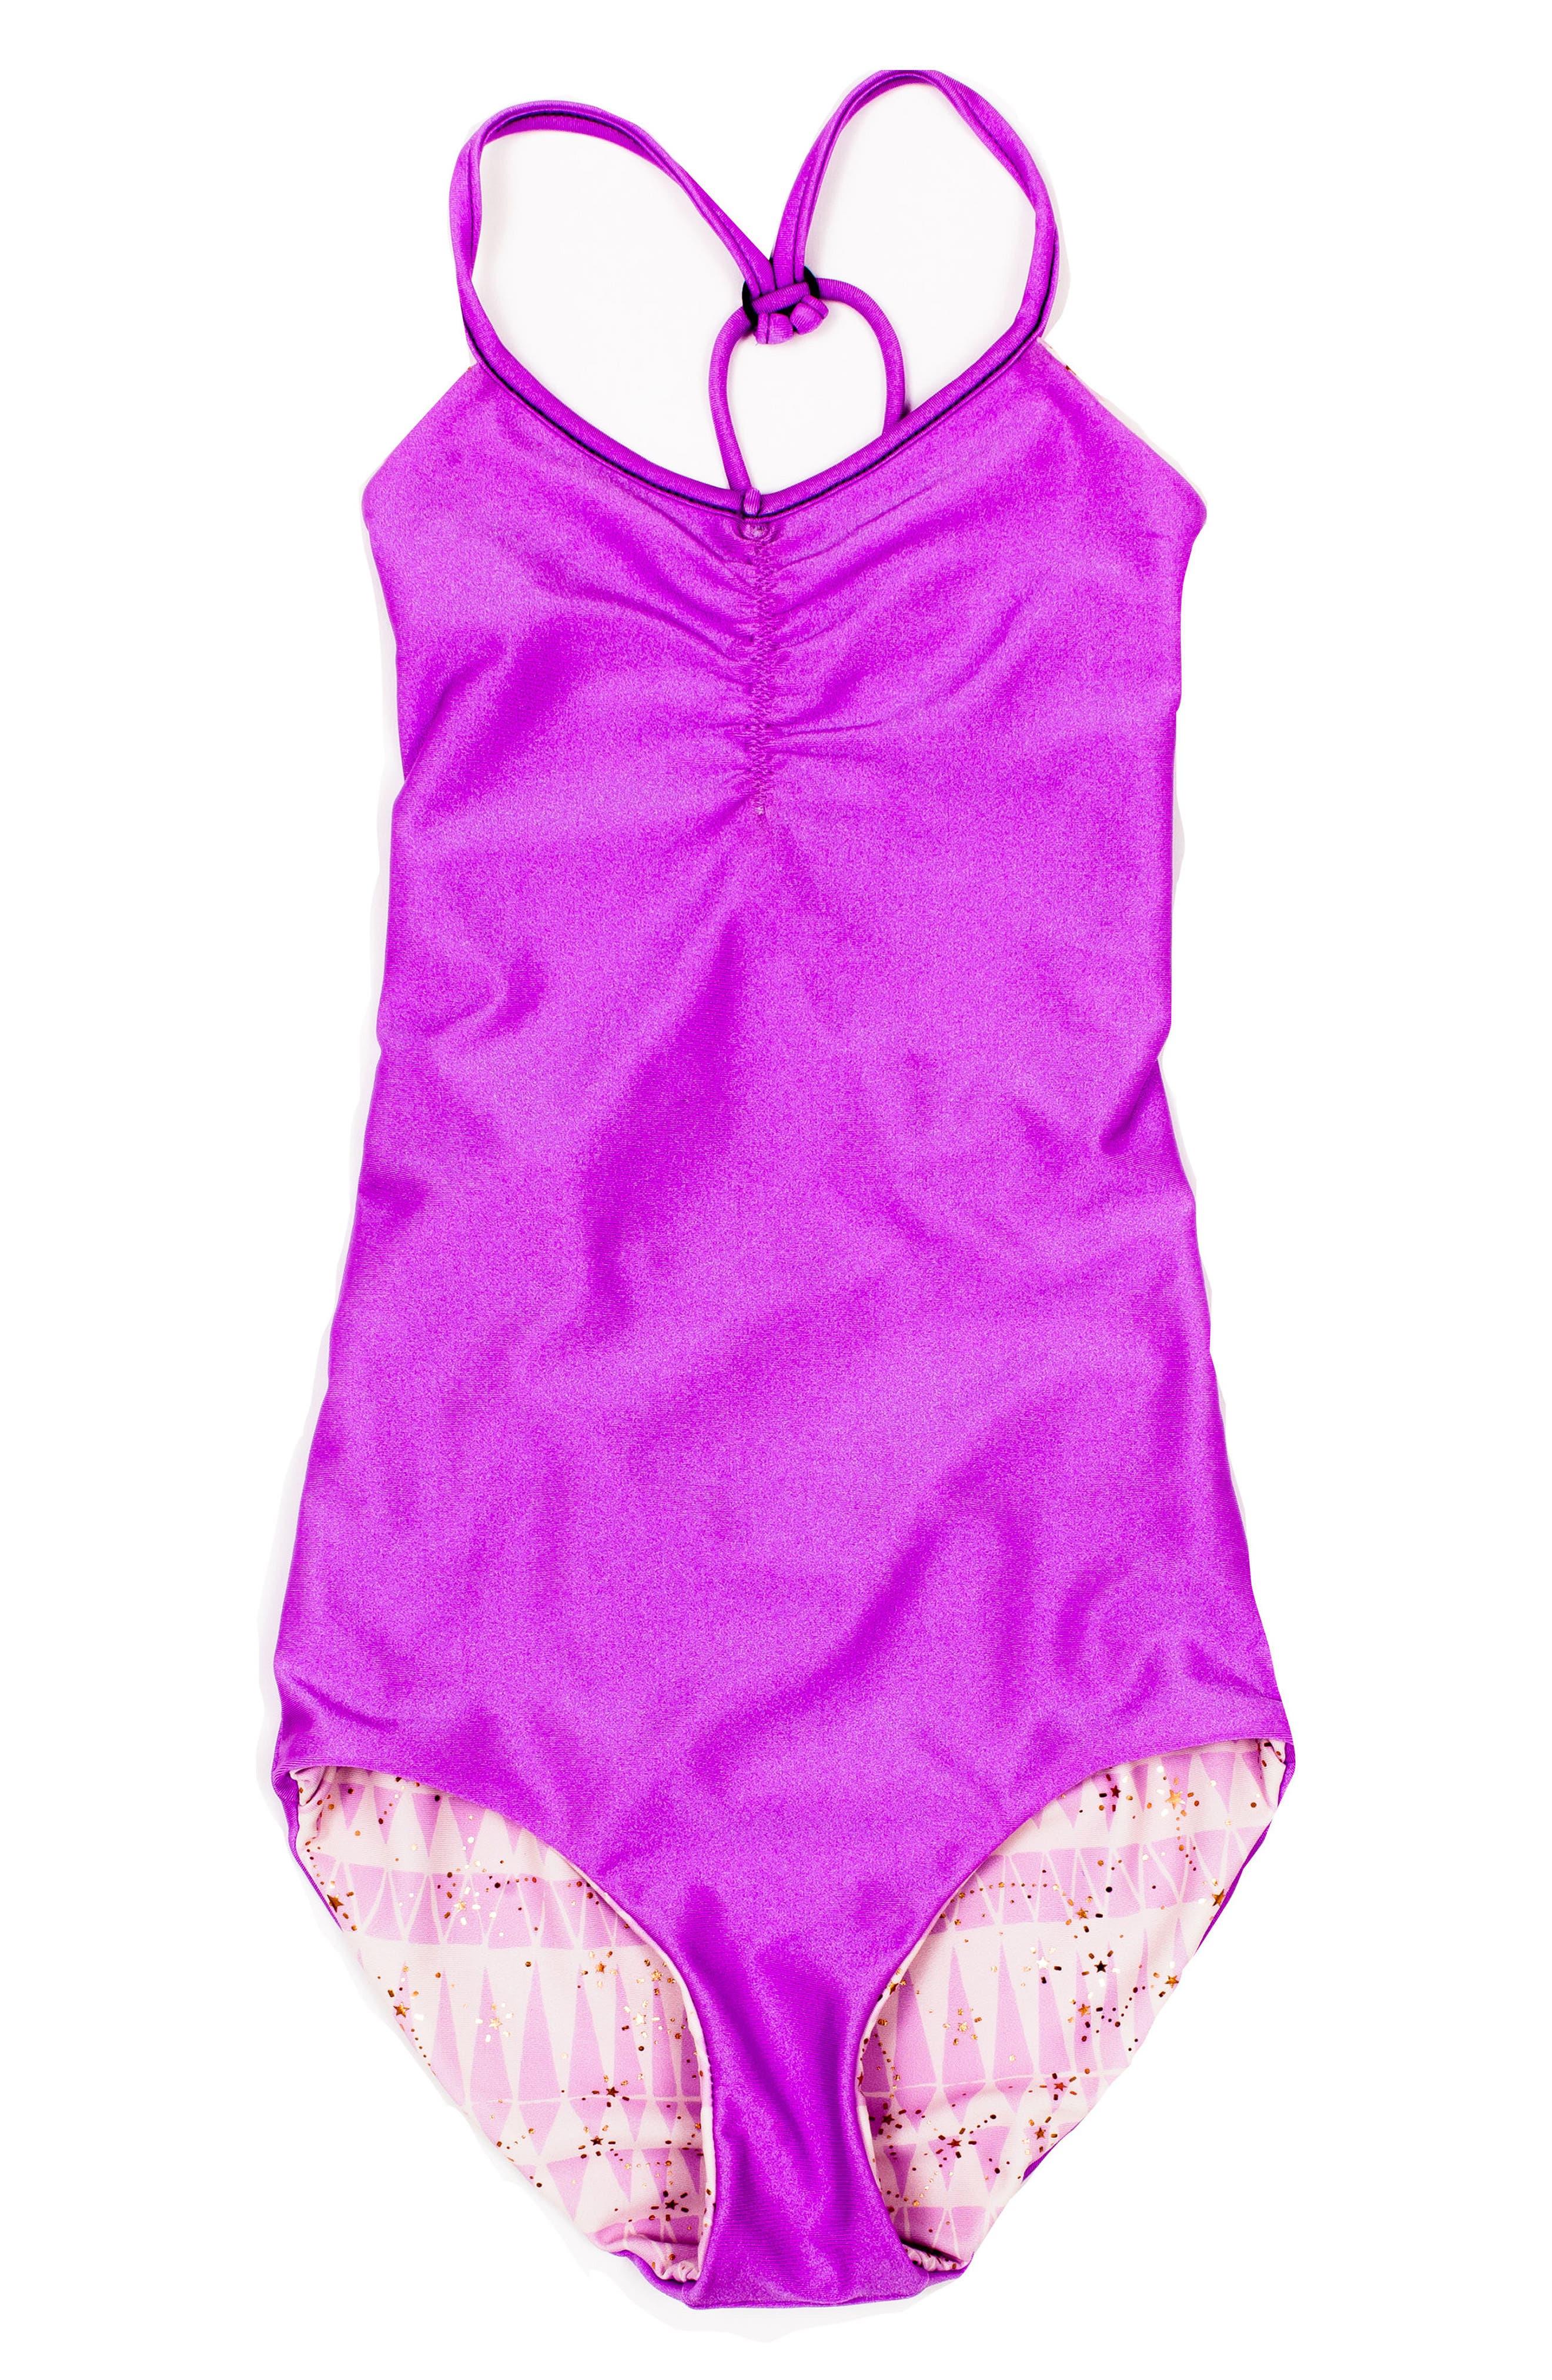 BOWIE X JAMES,                             Catalinakini One-Piece Reversible Swimsuit,                             Alternate thumbnail 2, color,                             LAVENDER